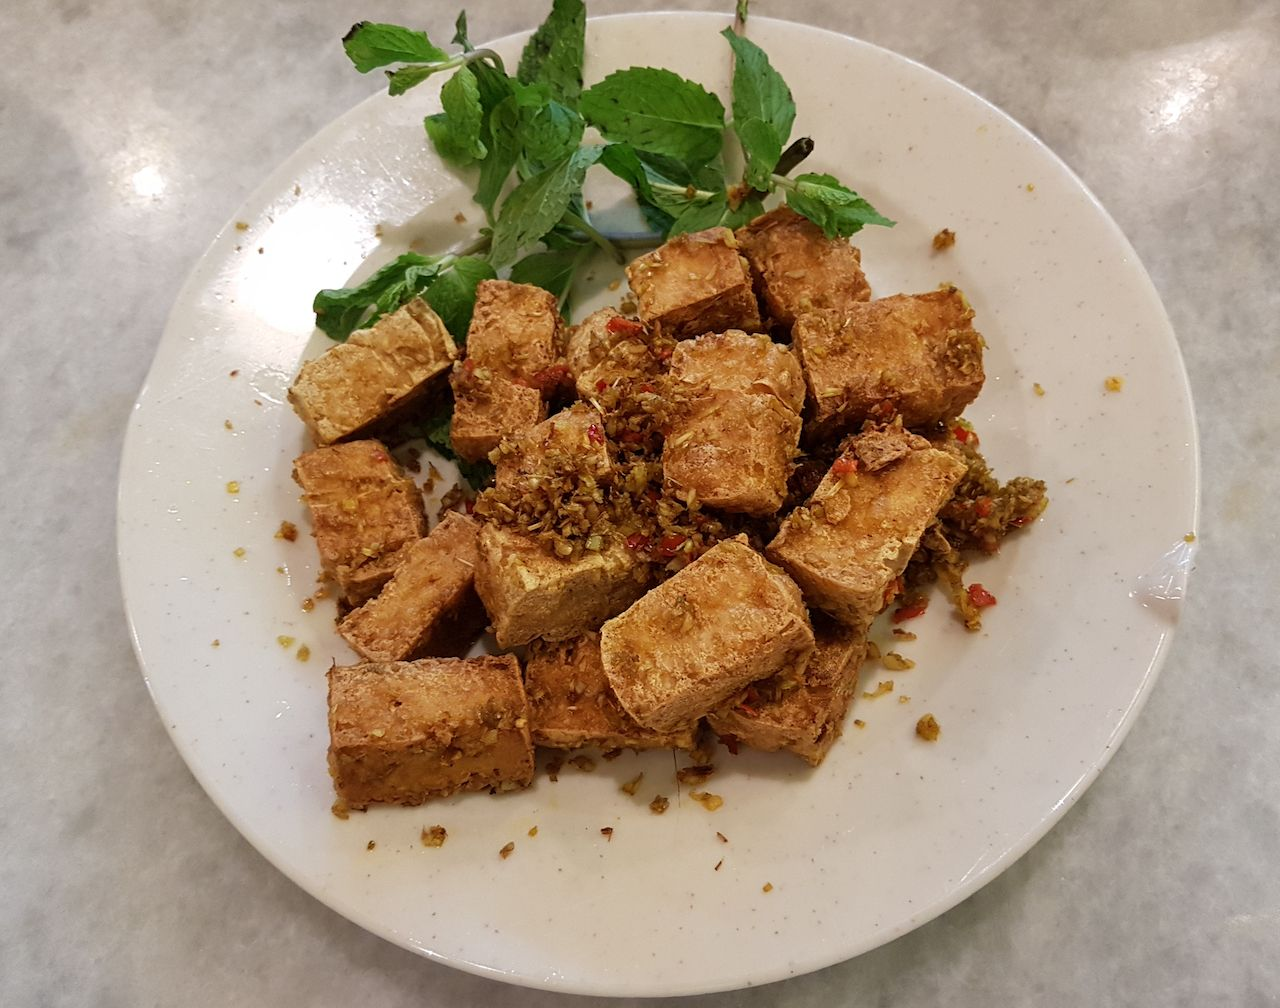 Vietnamese Fried Tofu in Lemongrass